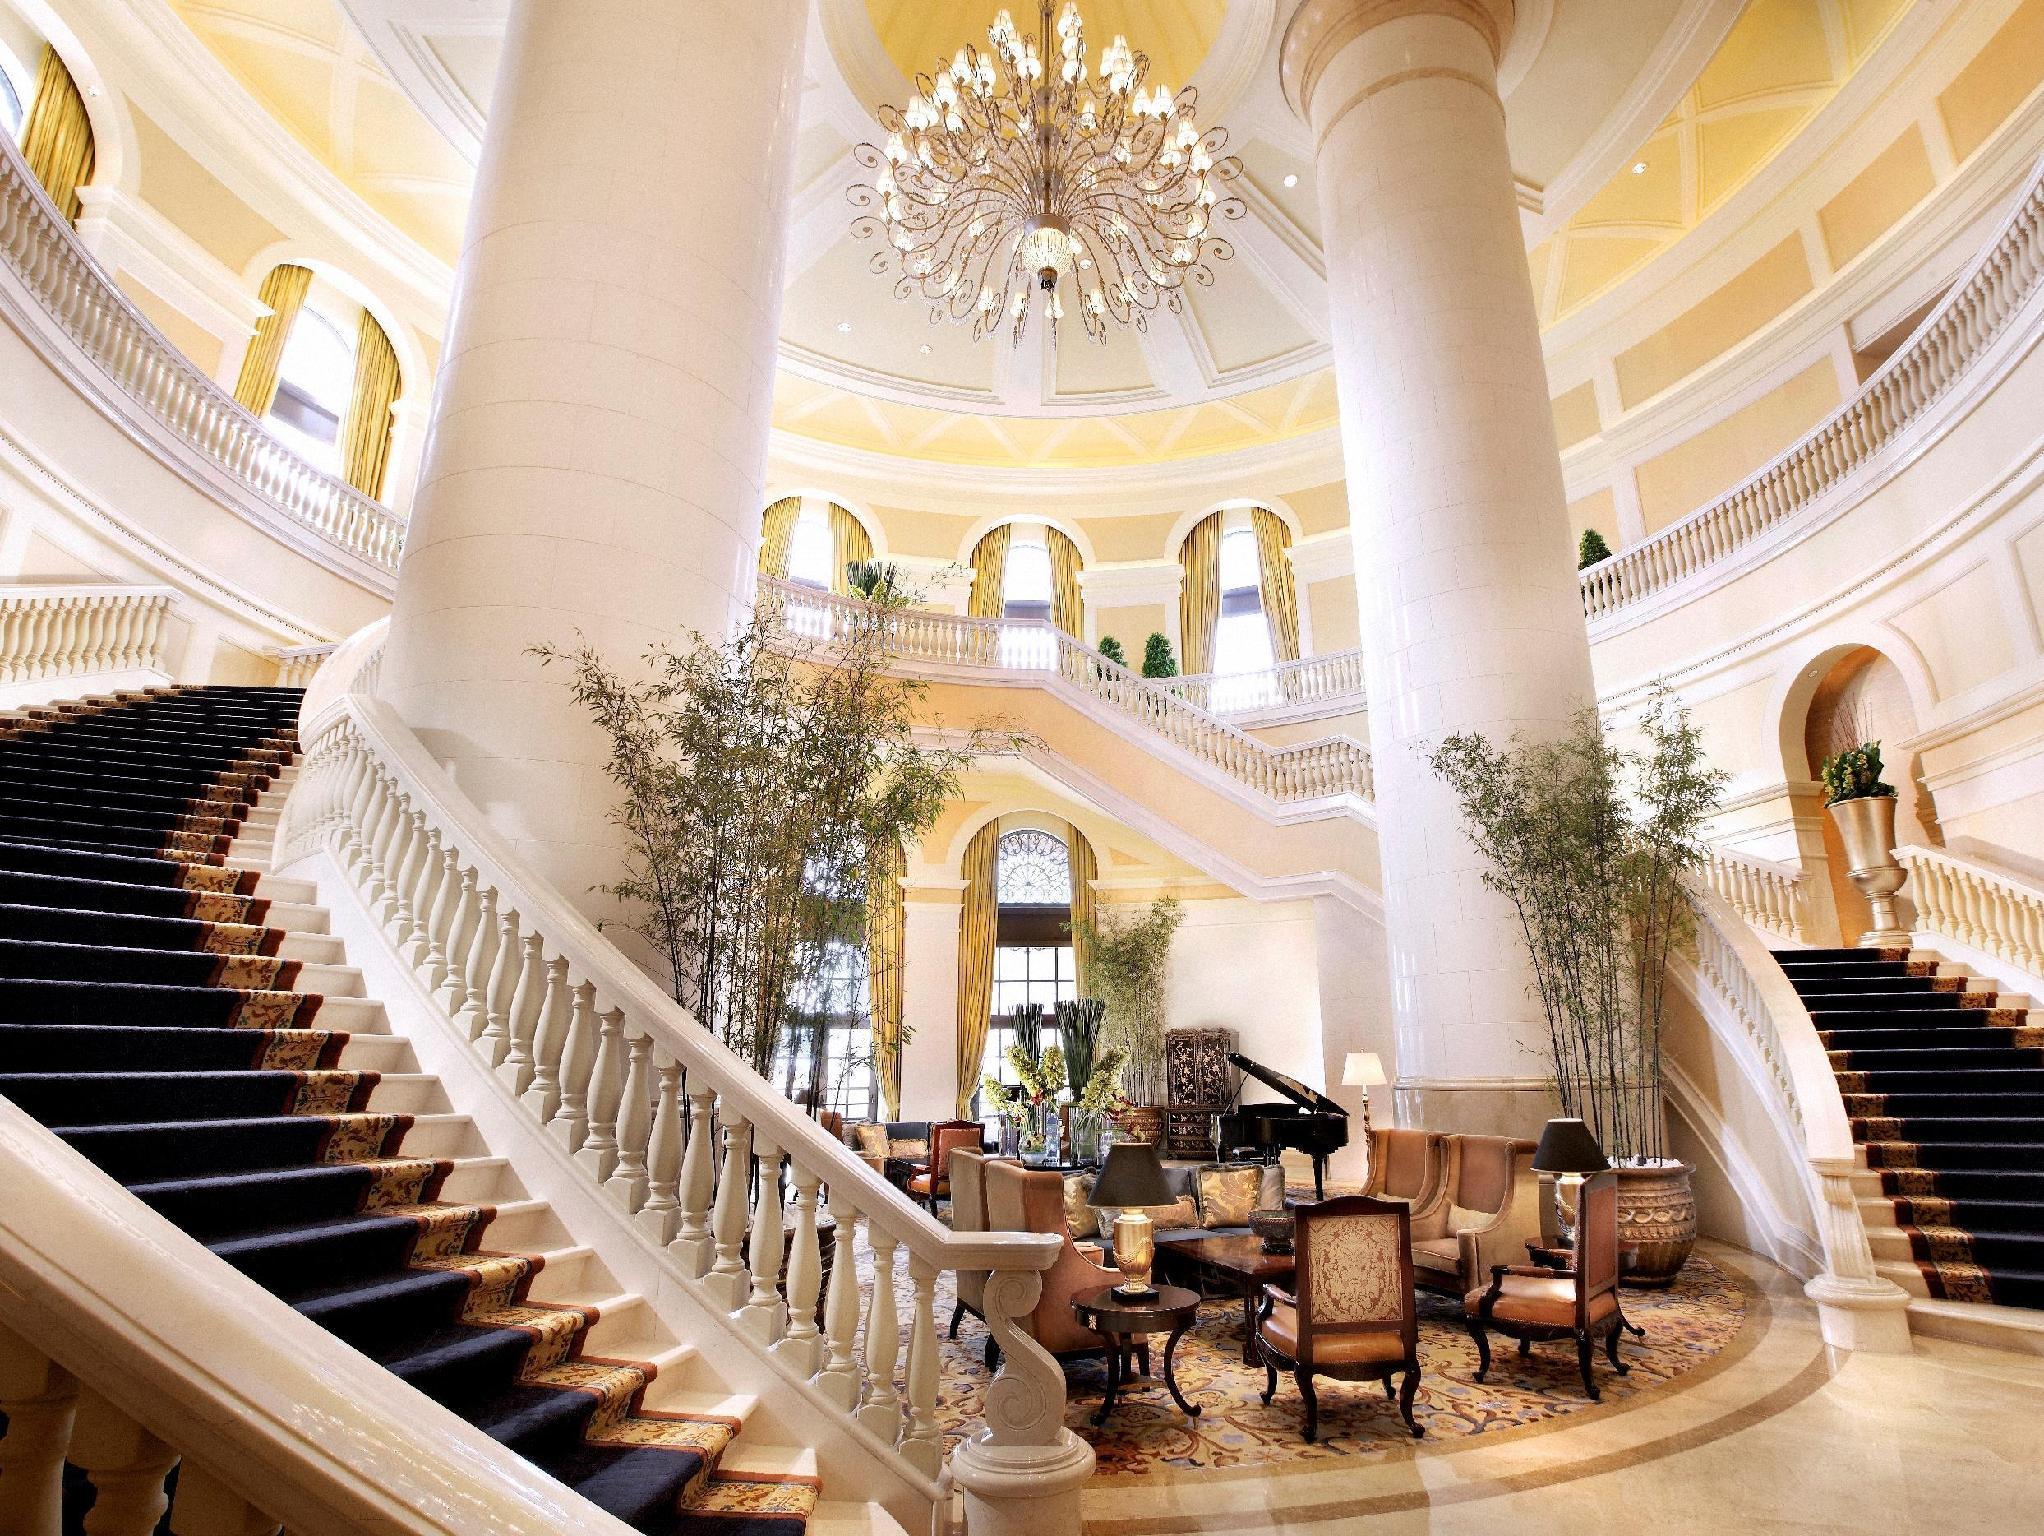 澳門澳門四季酒店 (Four Seasons Hotel Macao)線上訂房|Agoda.com